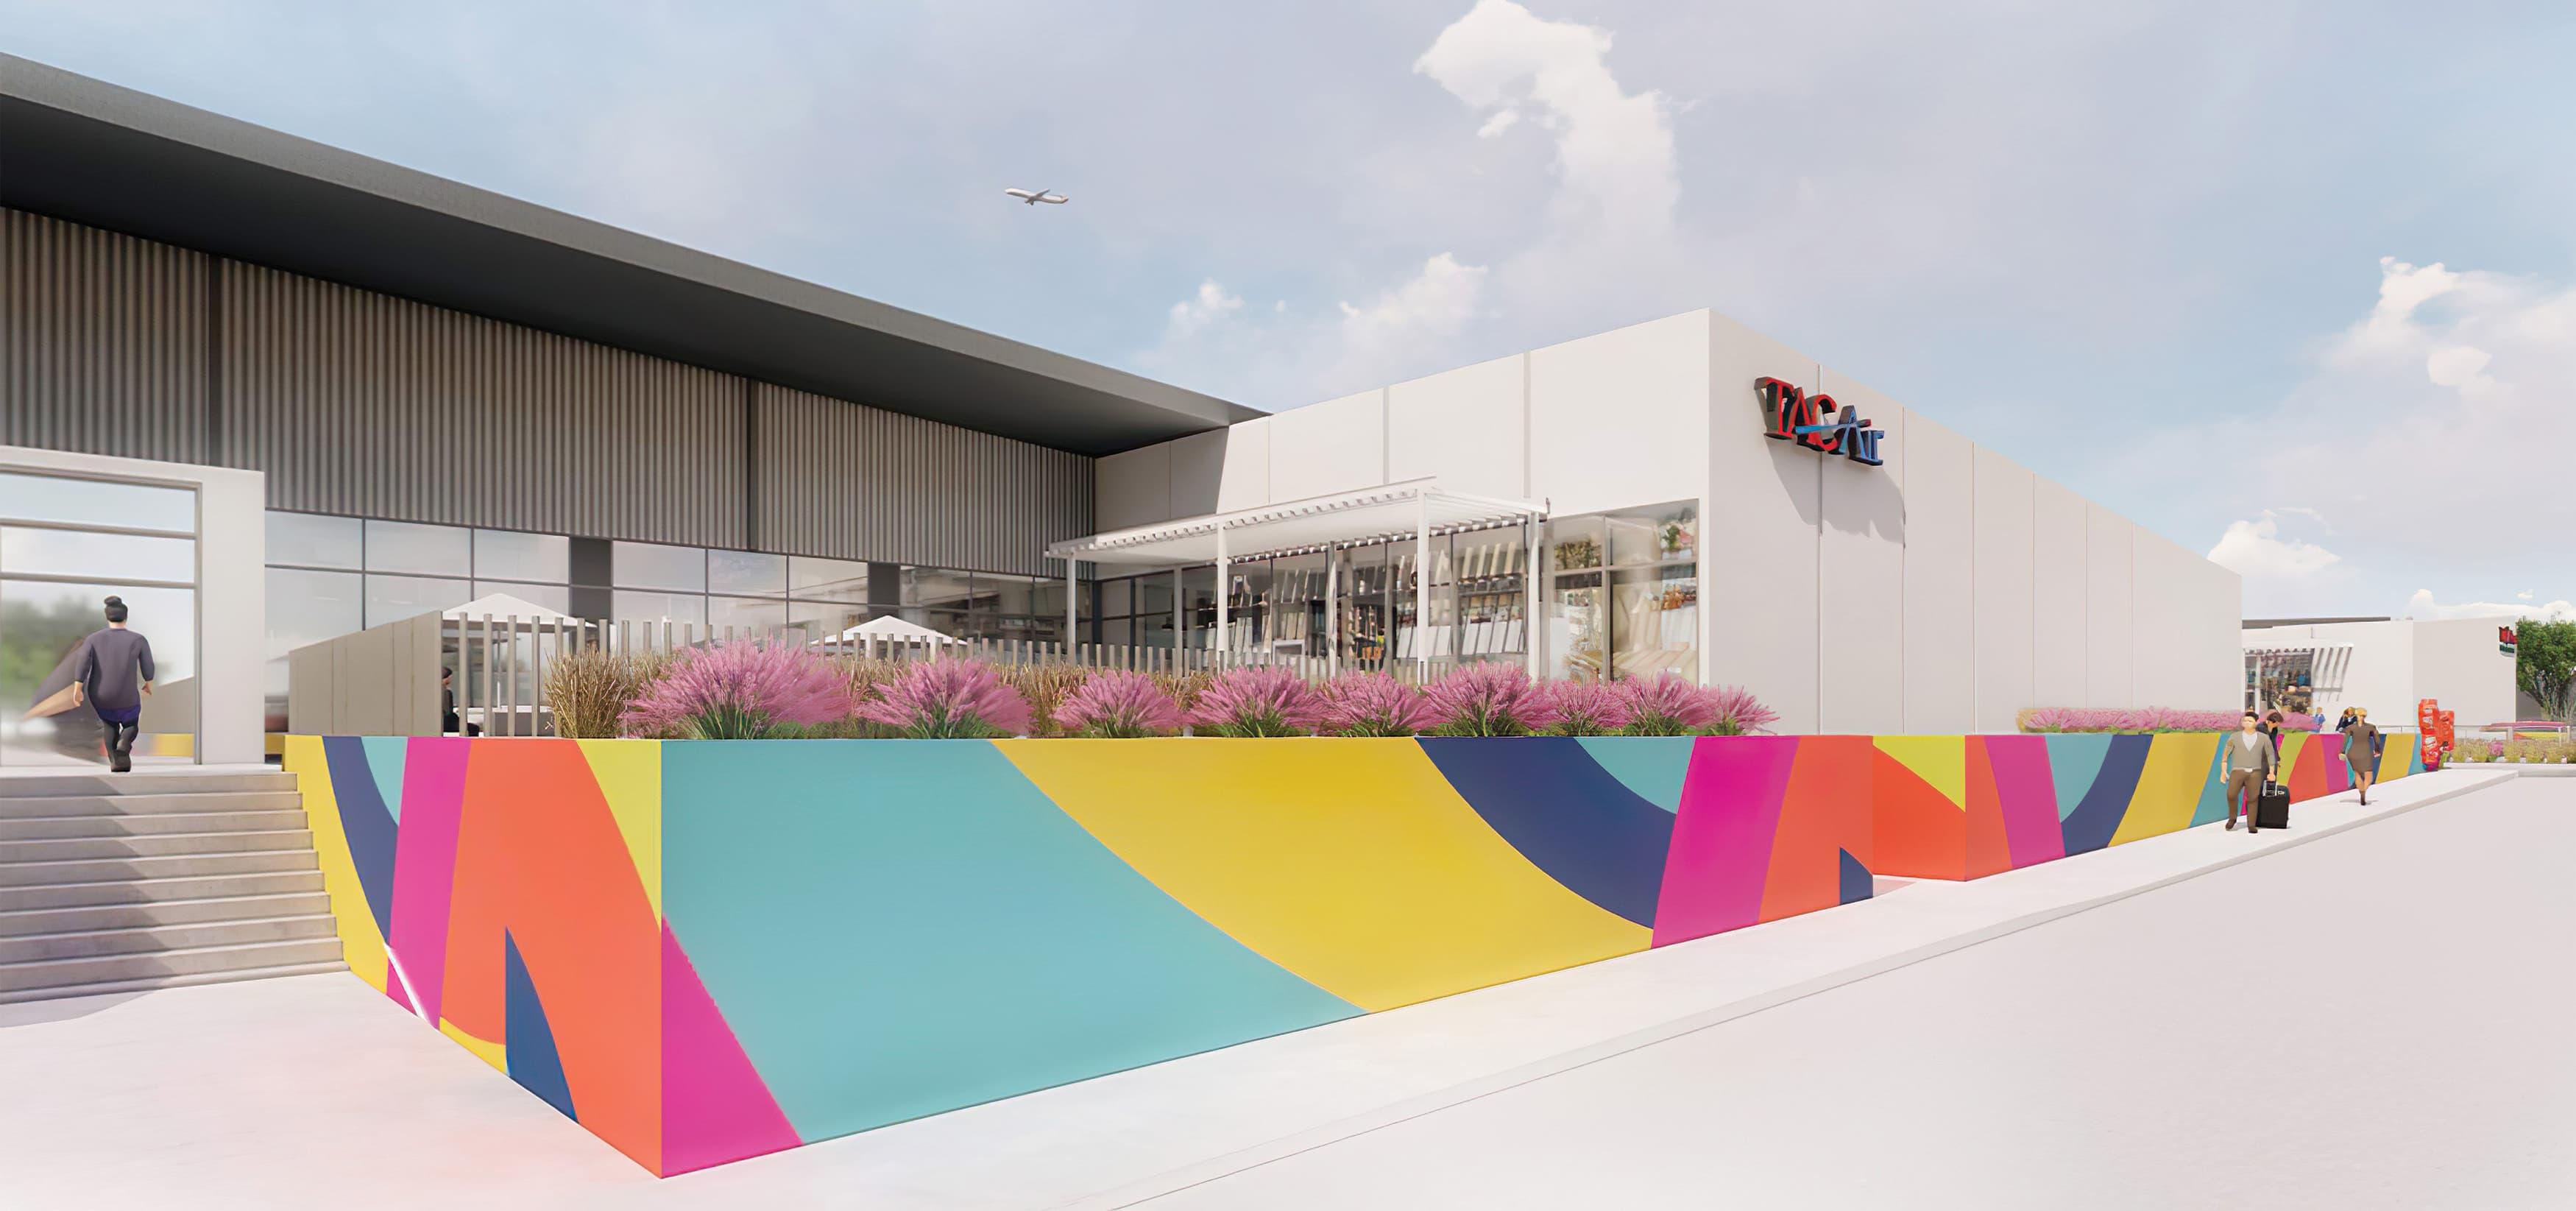 Braniff Center, a private aviation center, office space, and retail center in Dallas, Texas. Environmental Graphic Design. Graphic Architecture.